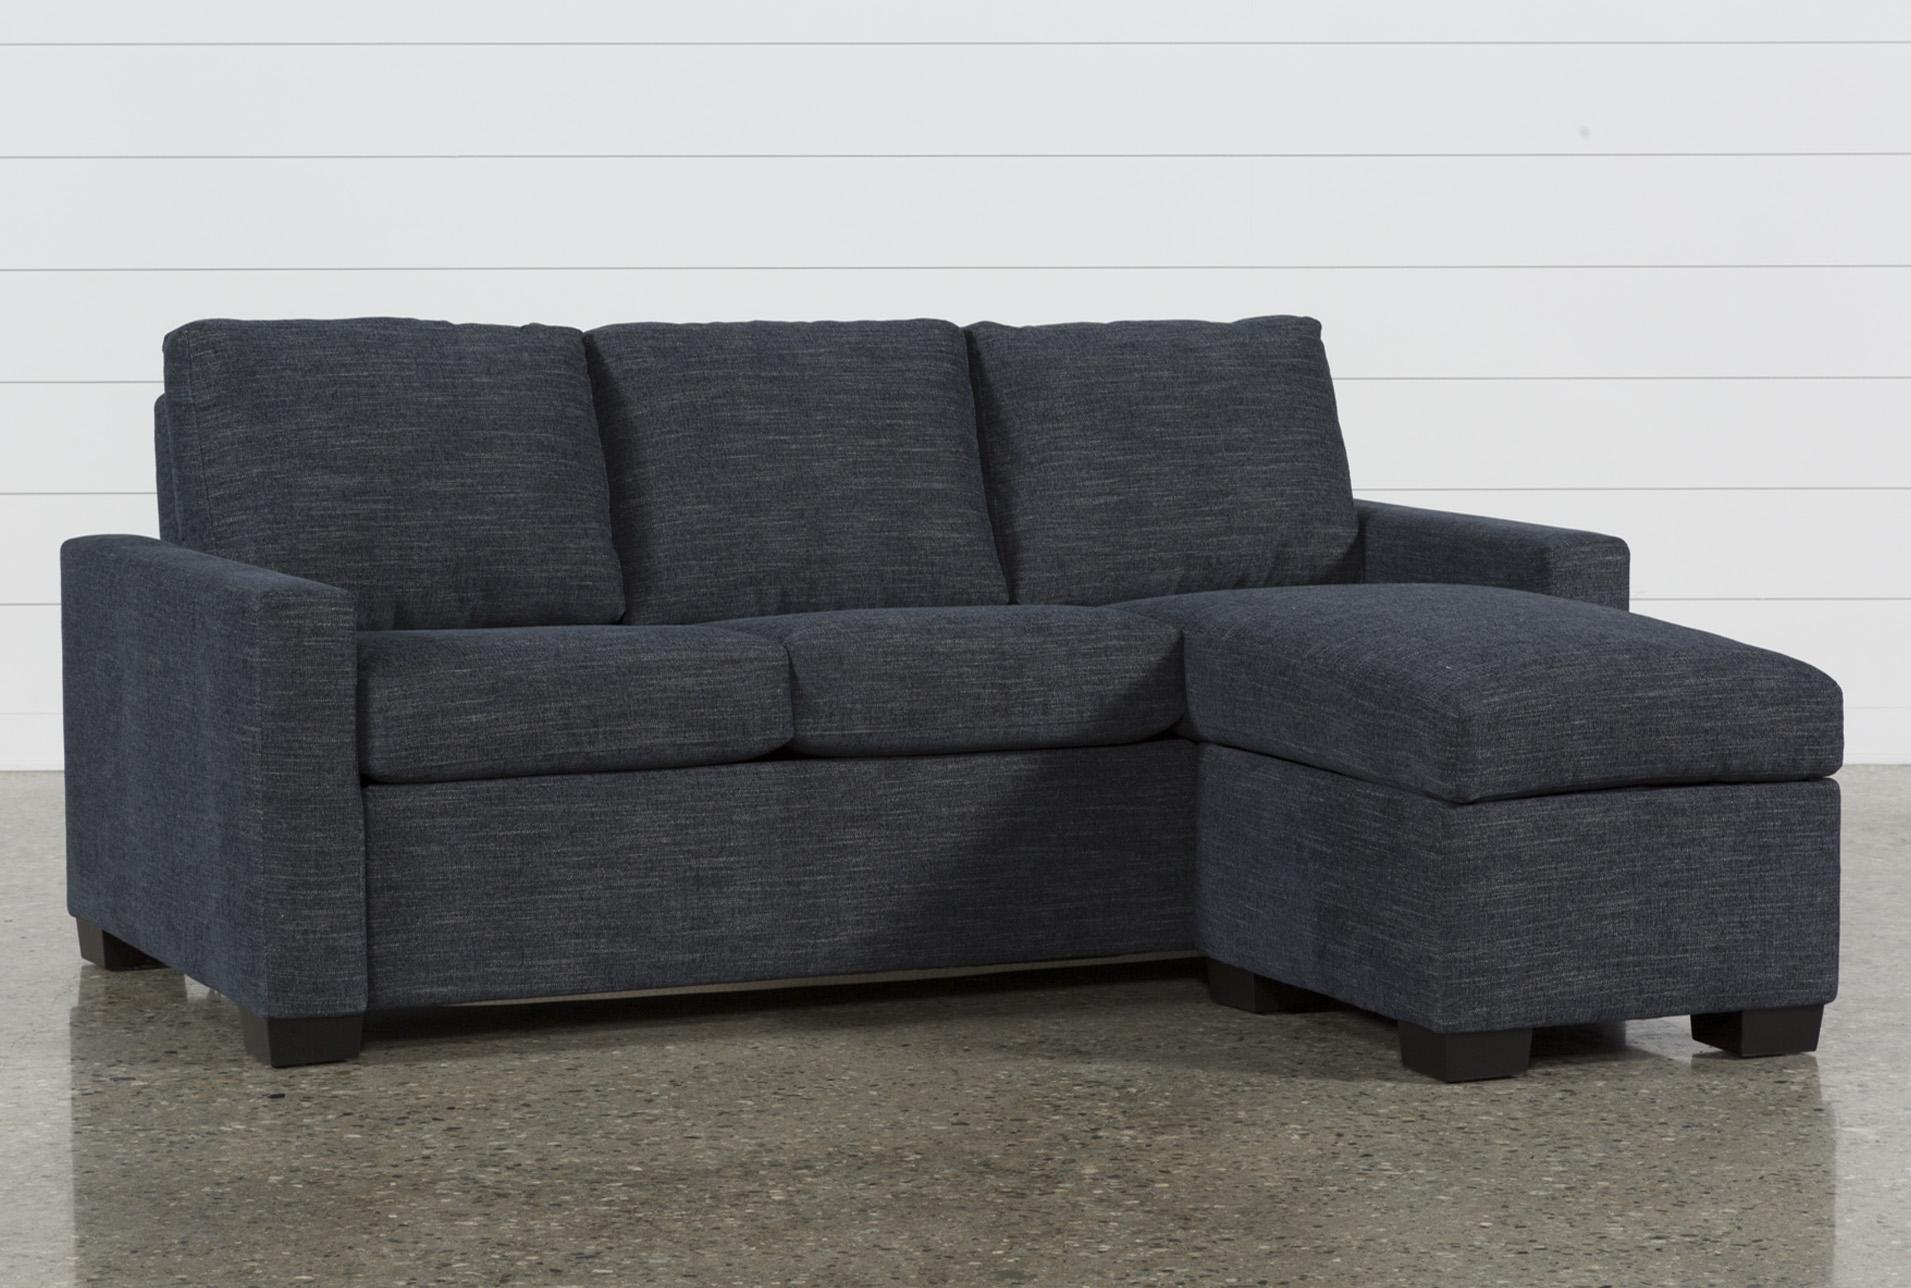 Mackenzie Denim Queen Plus Sofa Sleeper W/ Storage Chaise | Living Spaces